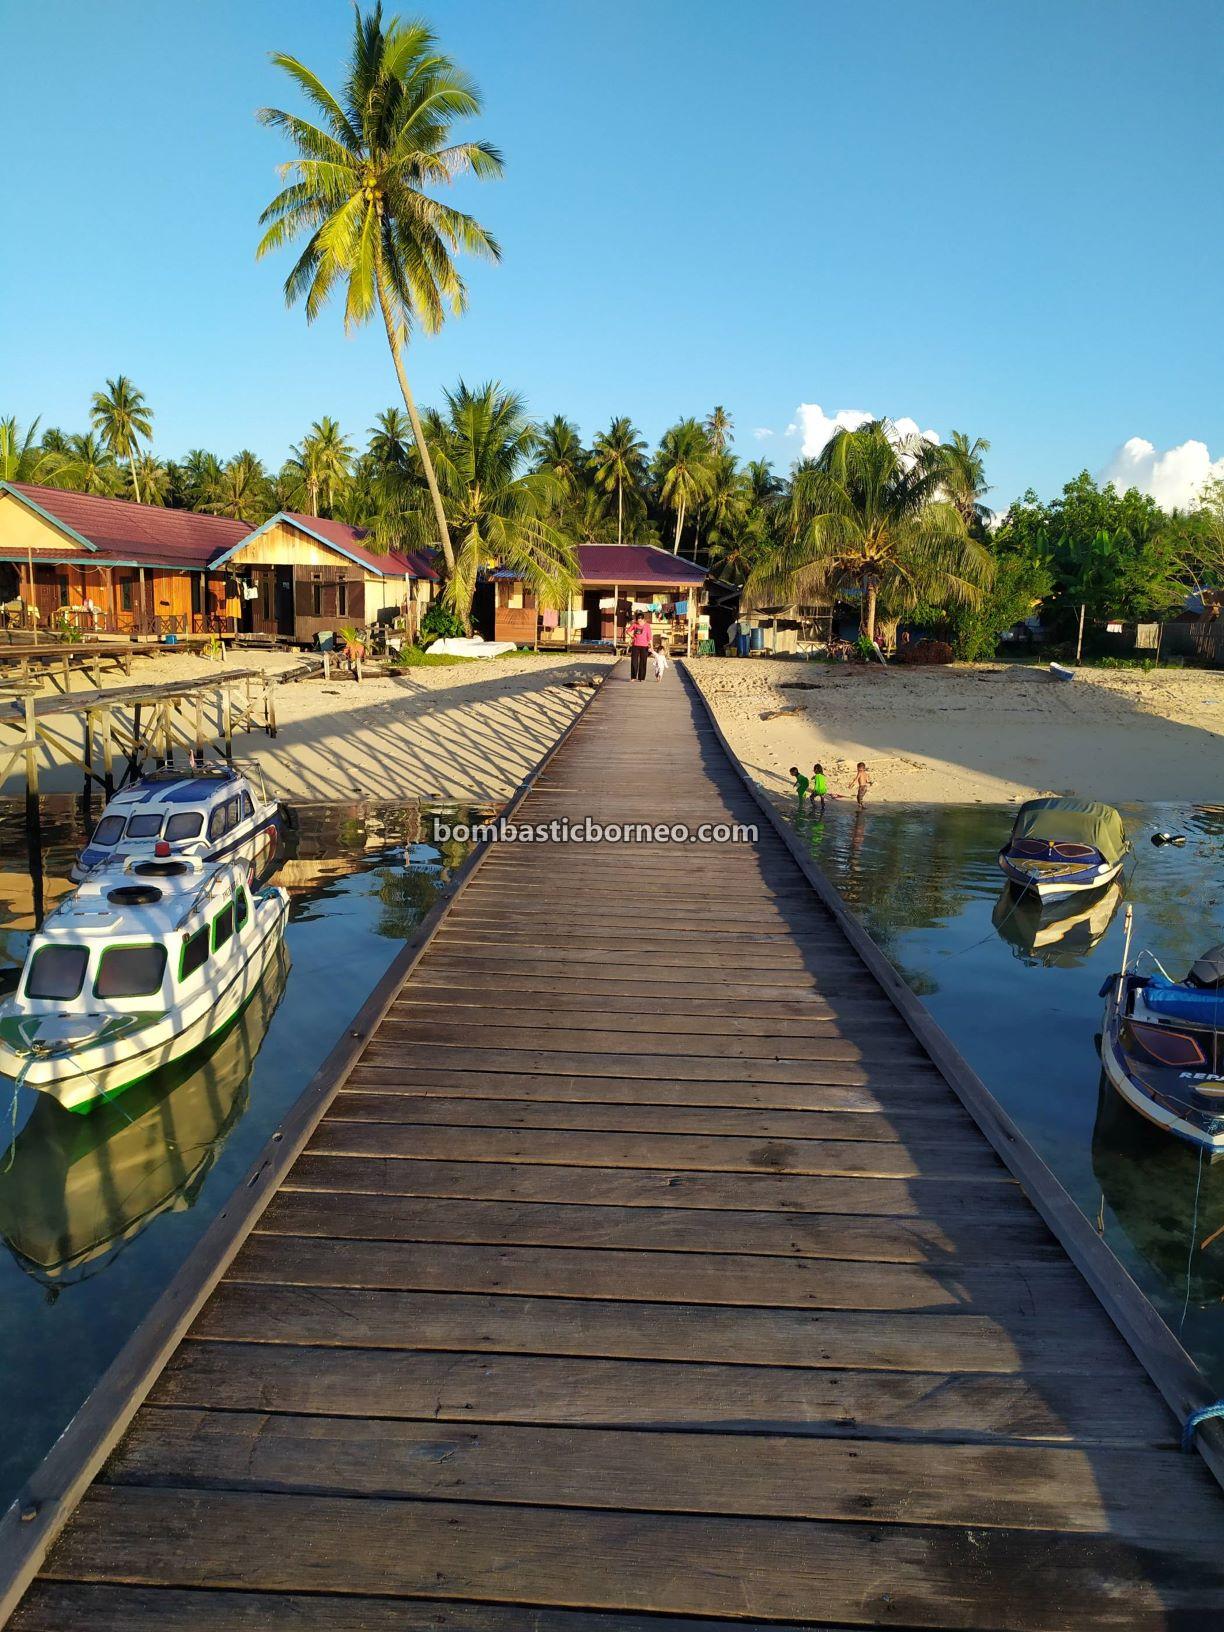 Kepulauan Derawan, Derawan Island, nature, hidden paradise, snorkelling, holiday, Berau, Kalimantan Timur, Indonesia, pasir putih, White sandy beaches, Pariwisata, tourist attraction, travel guide, Trans Borneo,